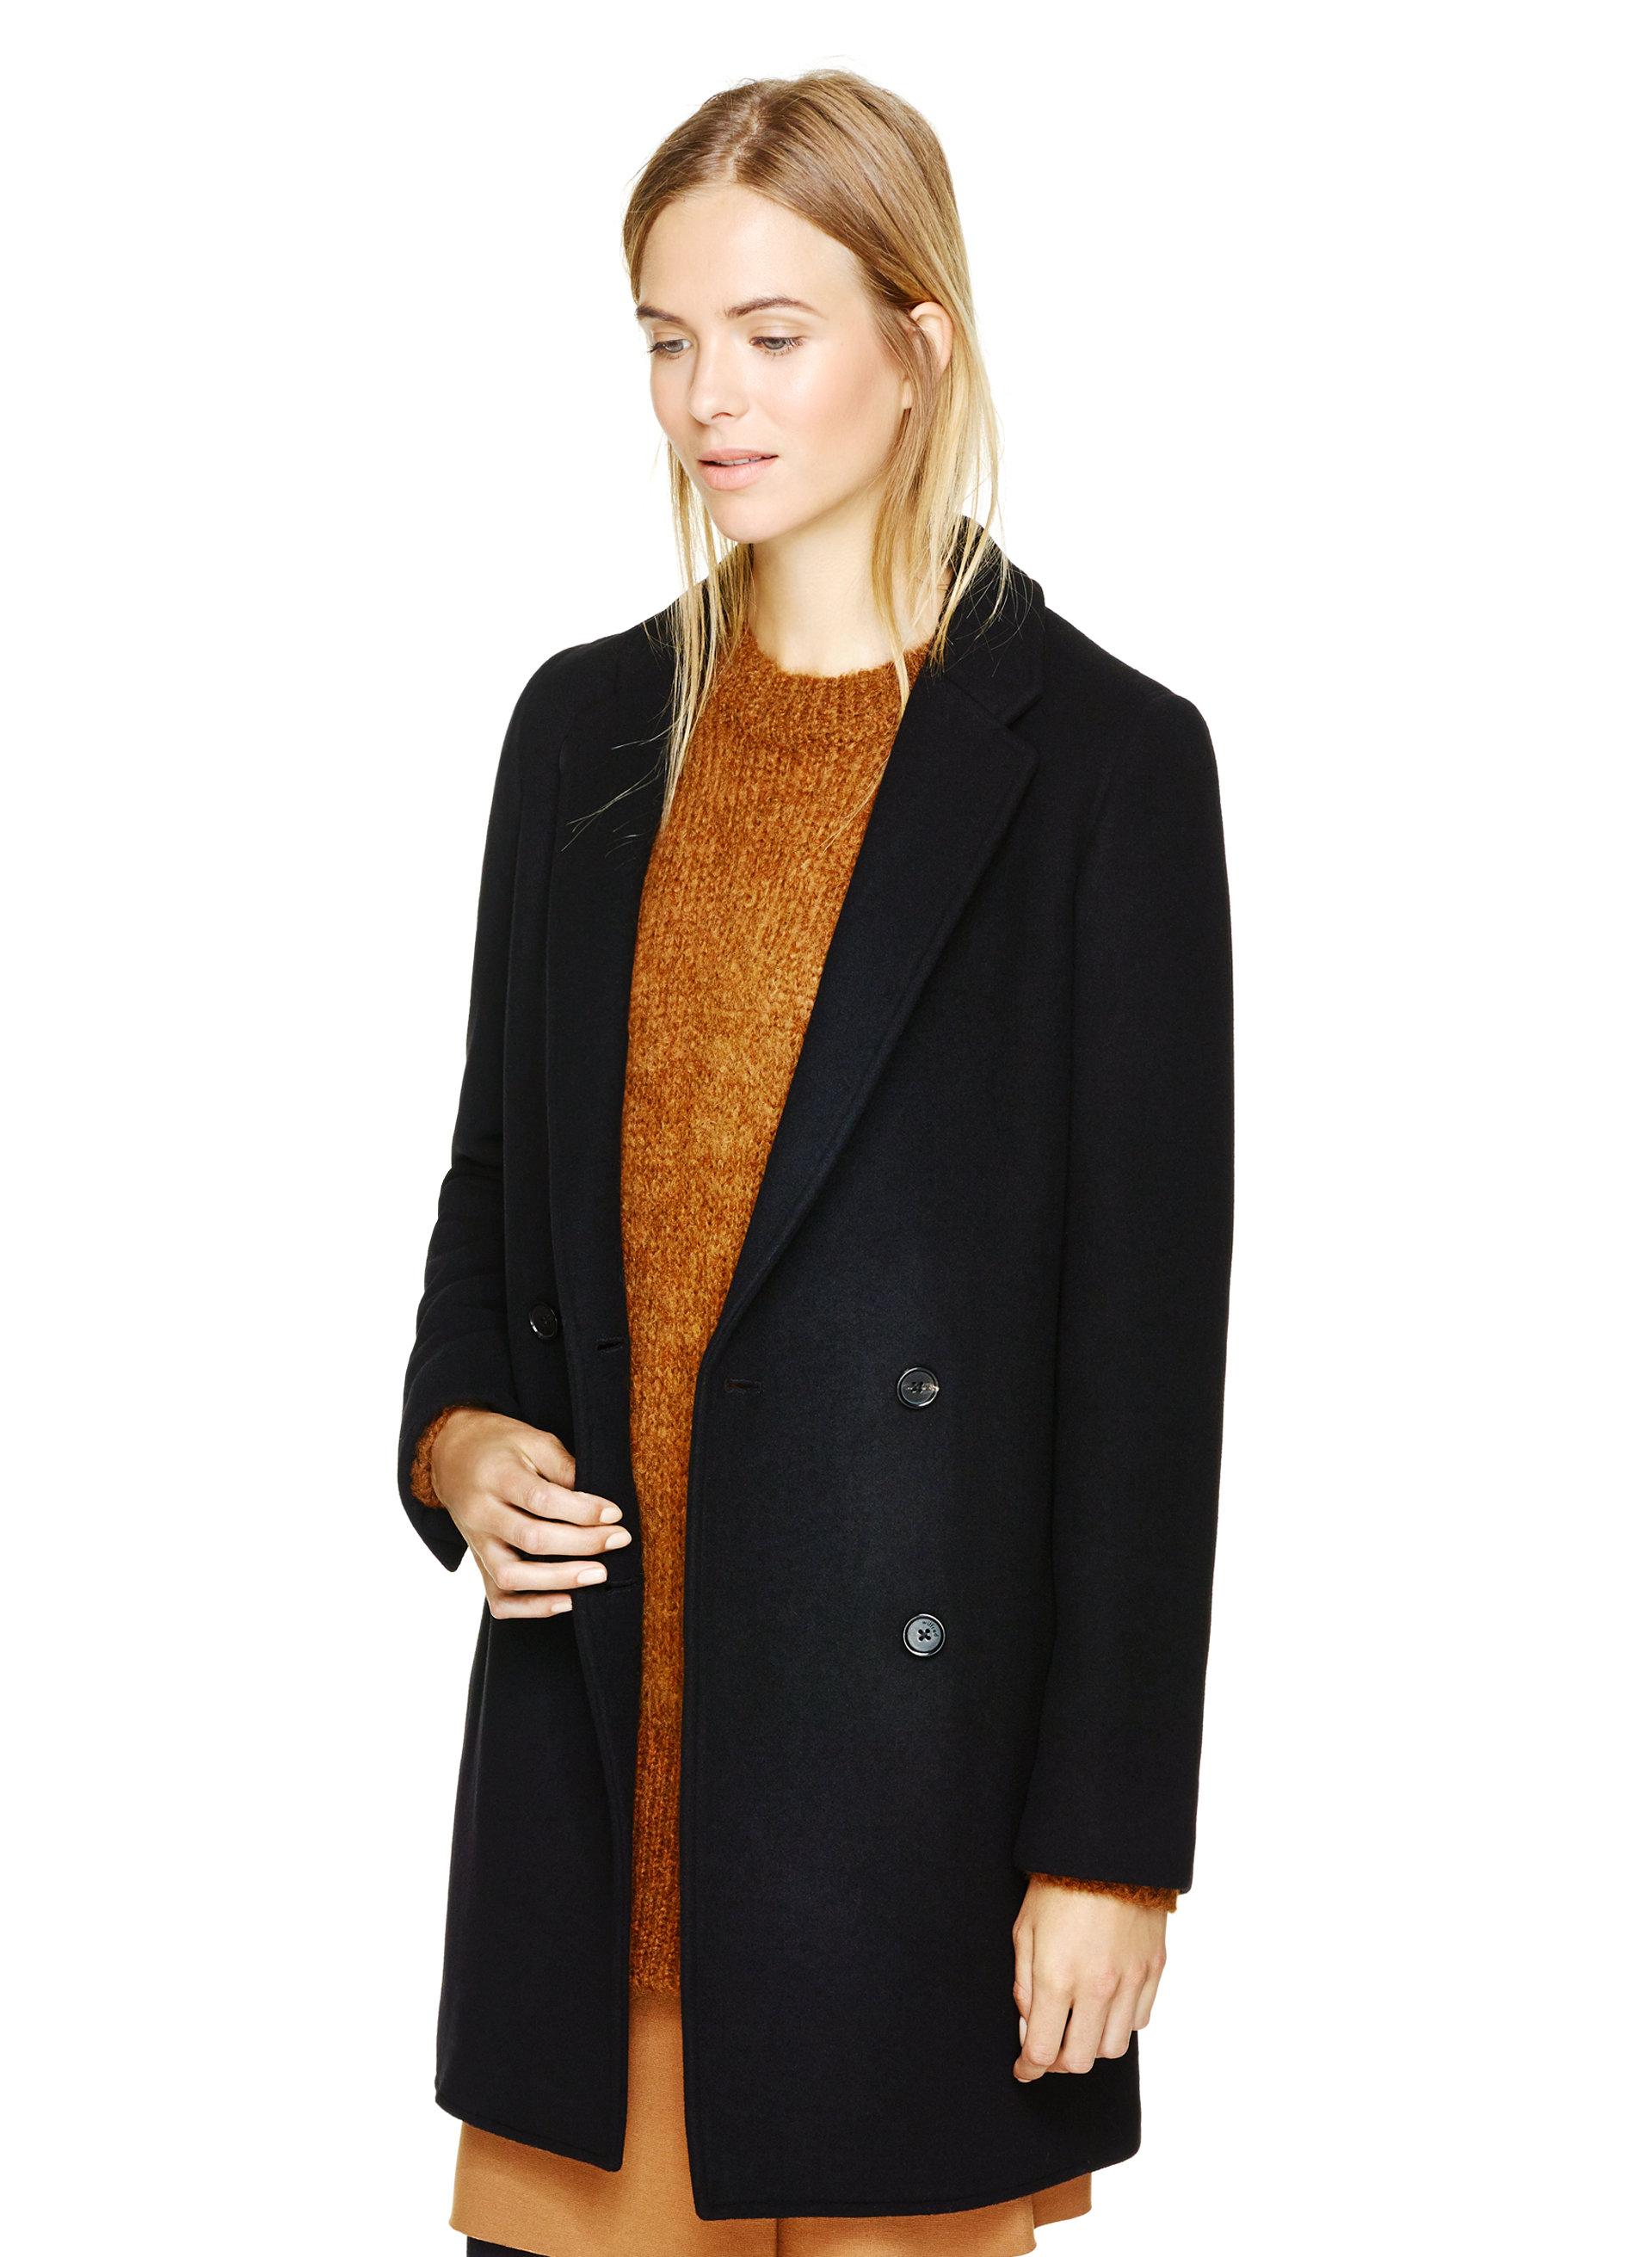 wilfred maison wool coat aritzia us